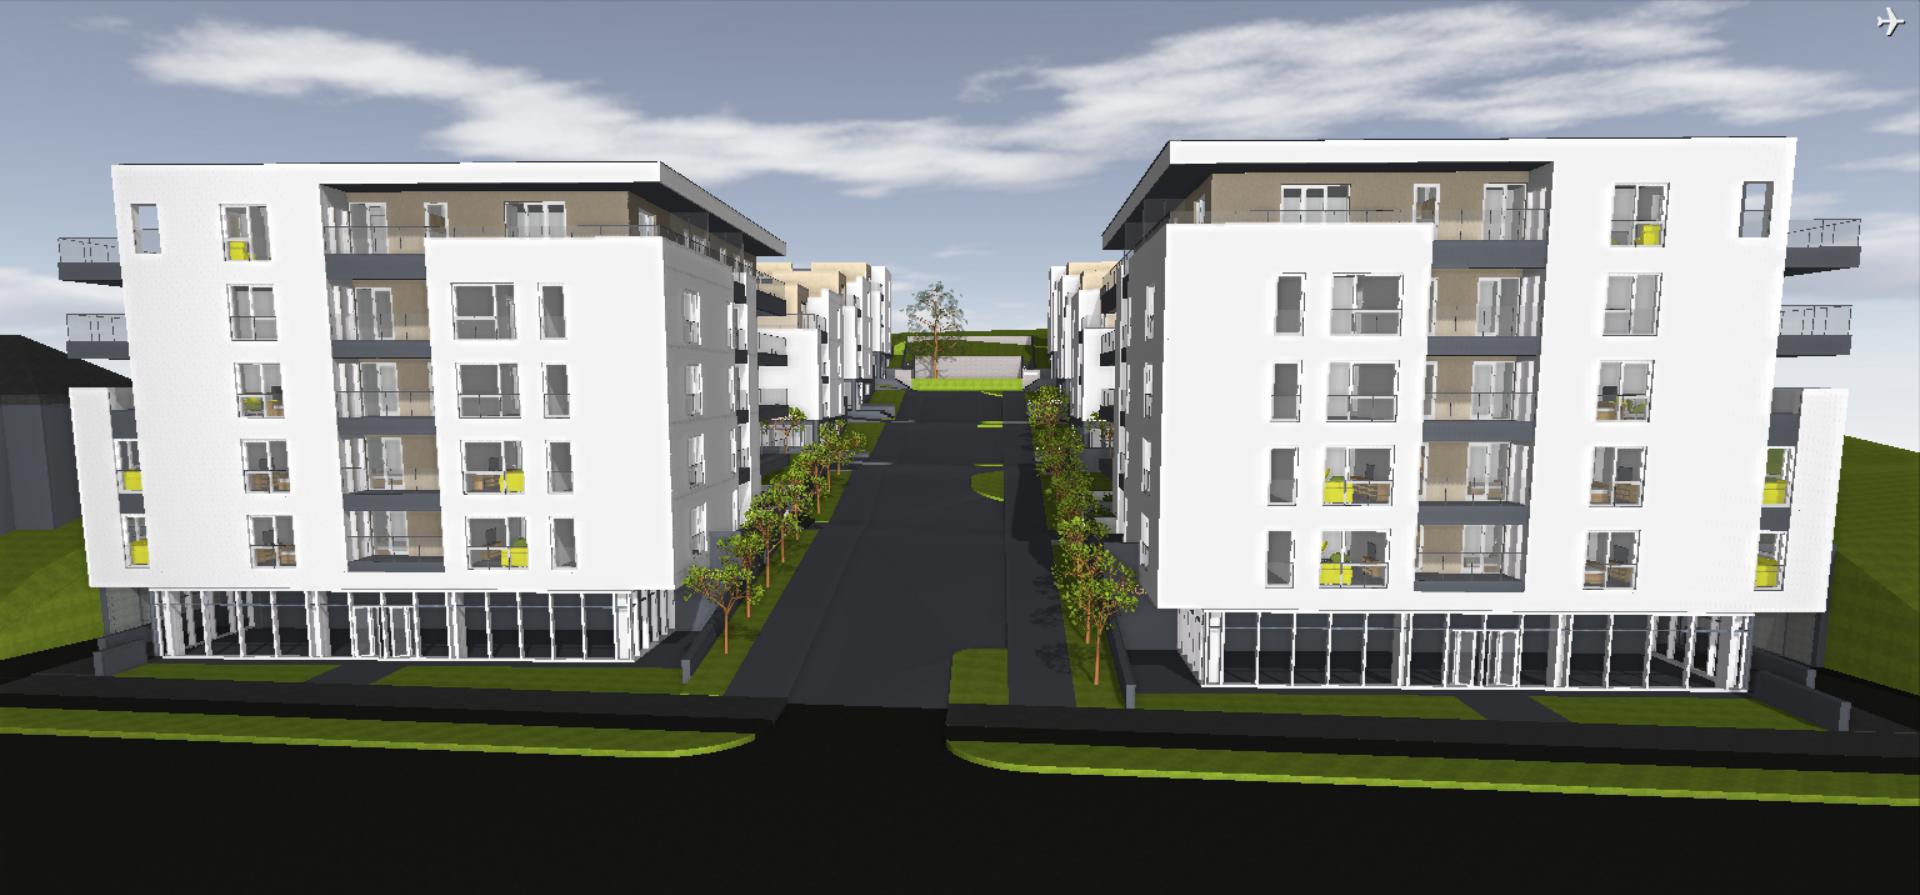 188001-Vanzare apartamente bloc nou, Iris, Cluj-Napoca